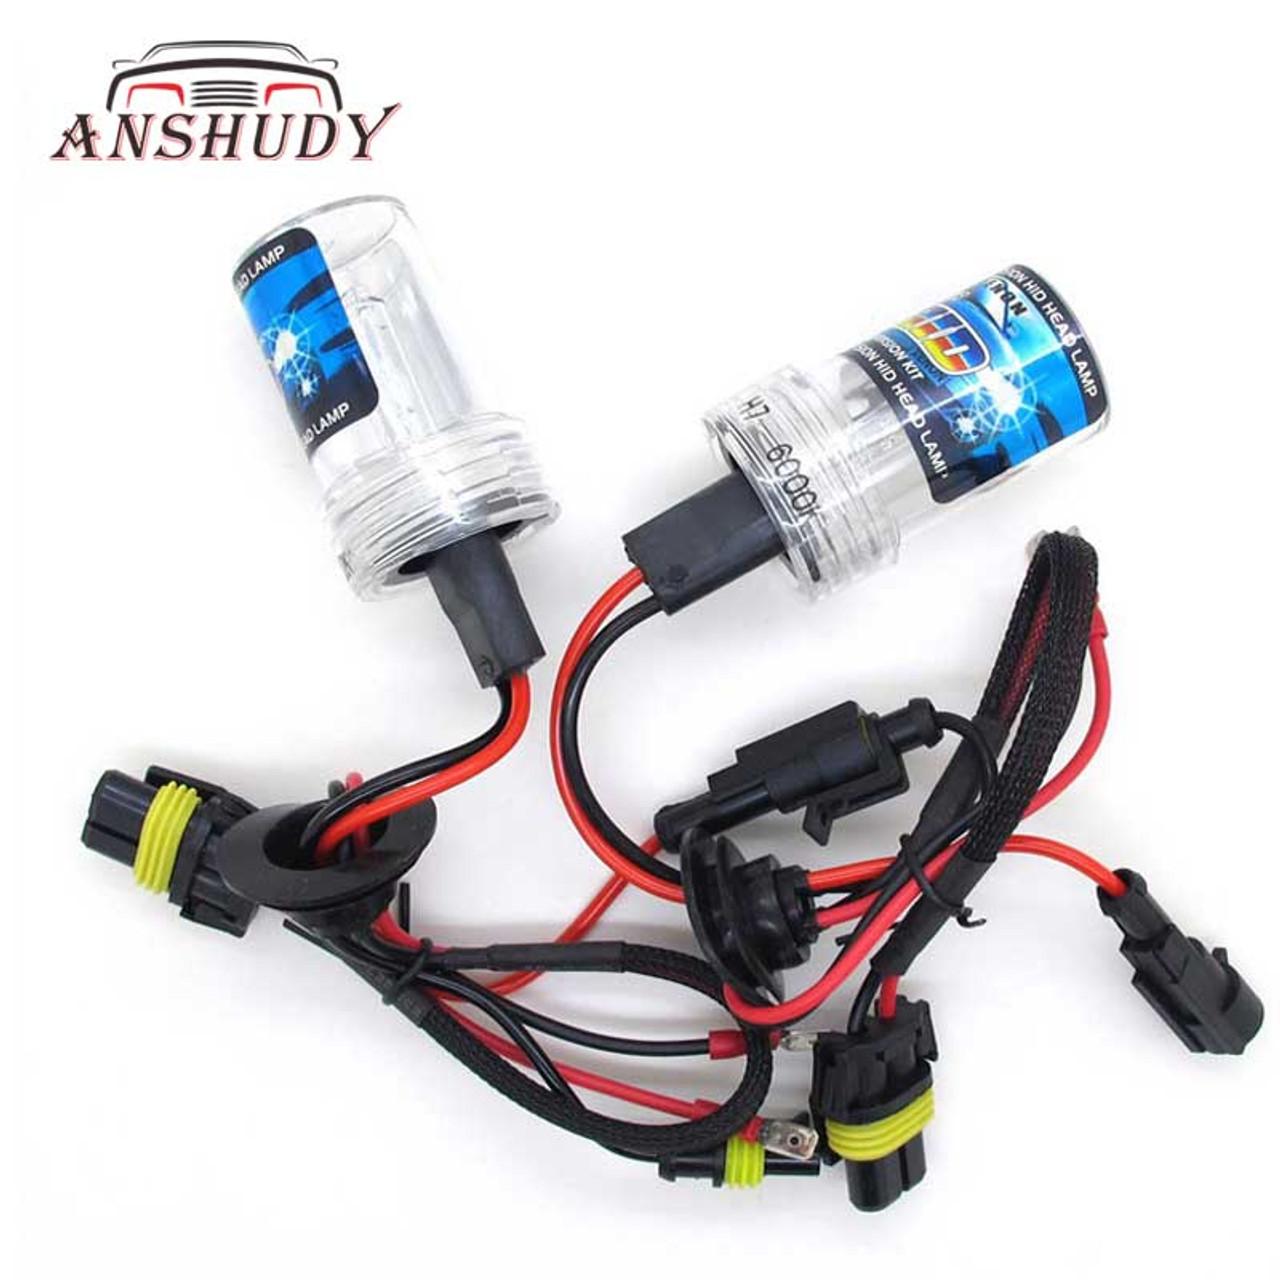 Brand New 2Pcs AC 35W Car Xenon HID 9005 HB3 4300K Head Light Bulbs Fog Lamps